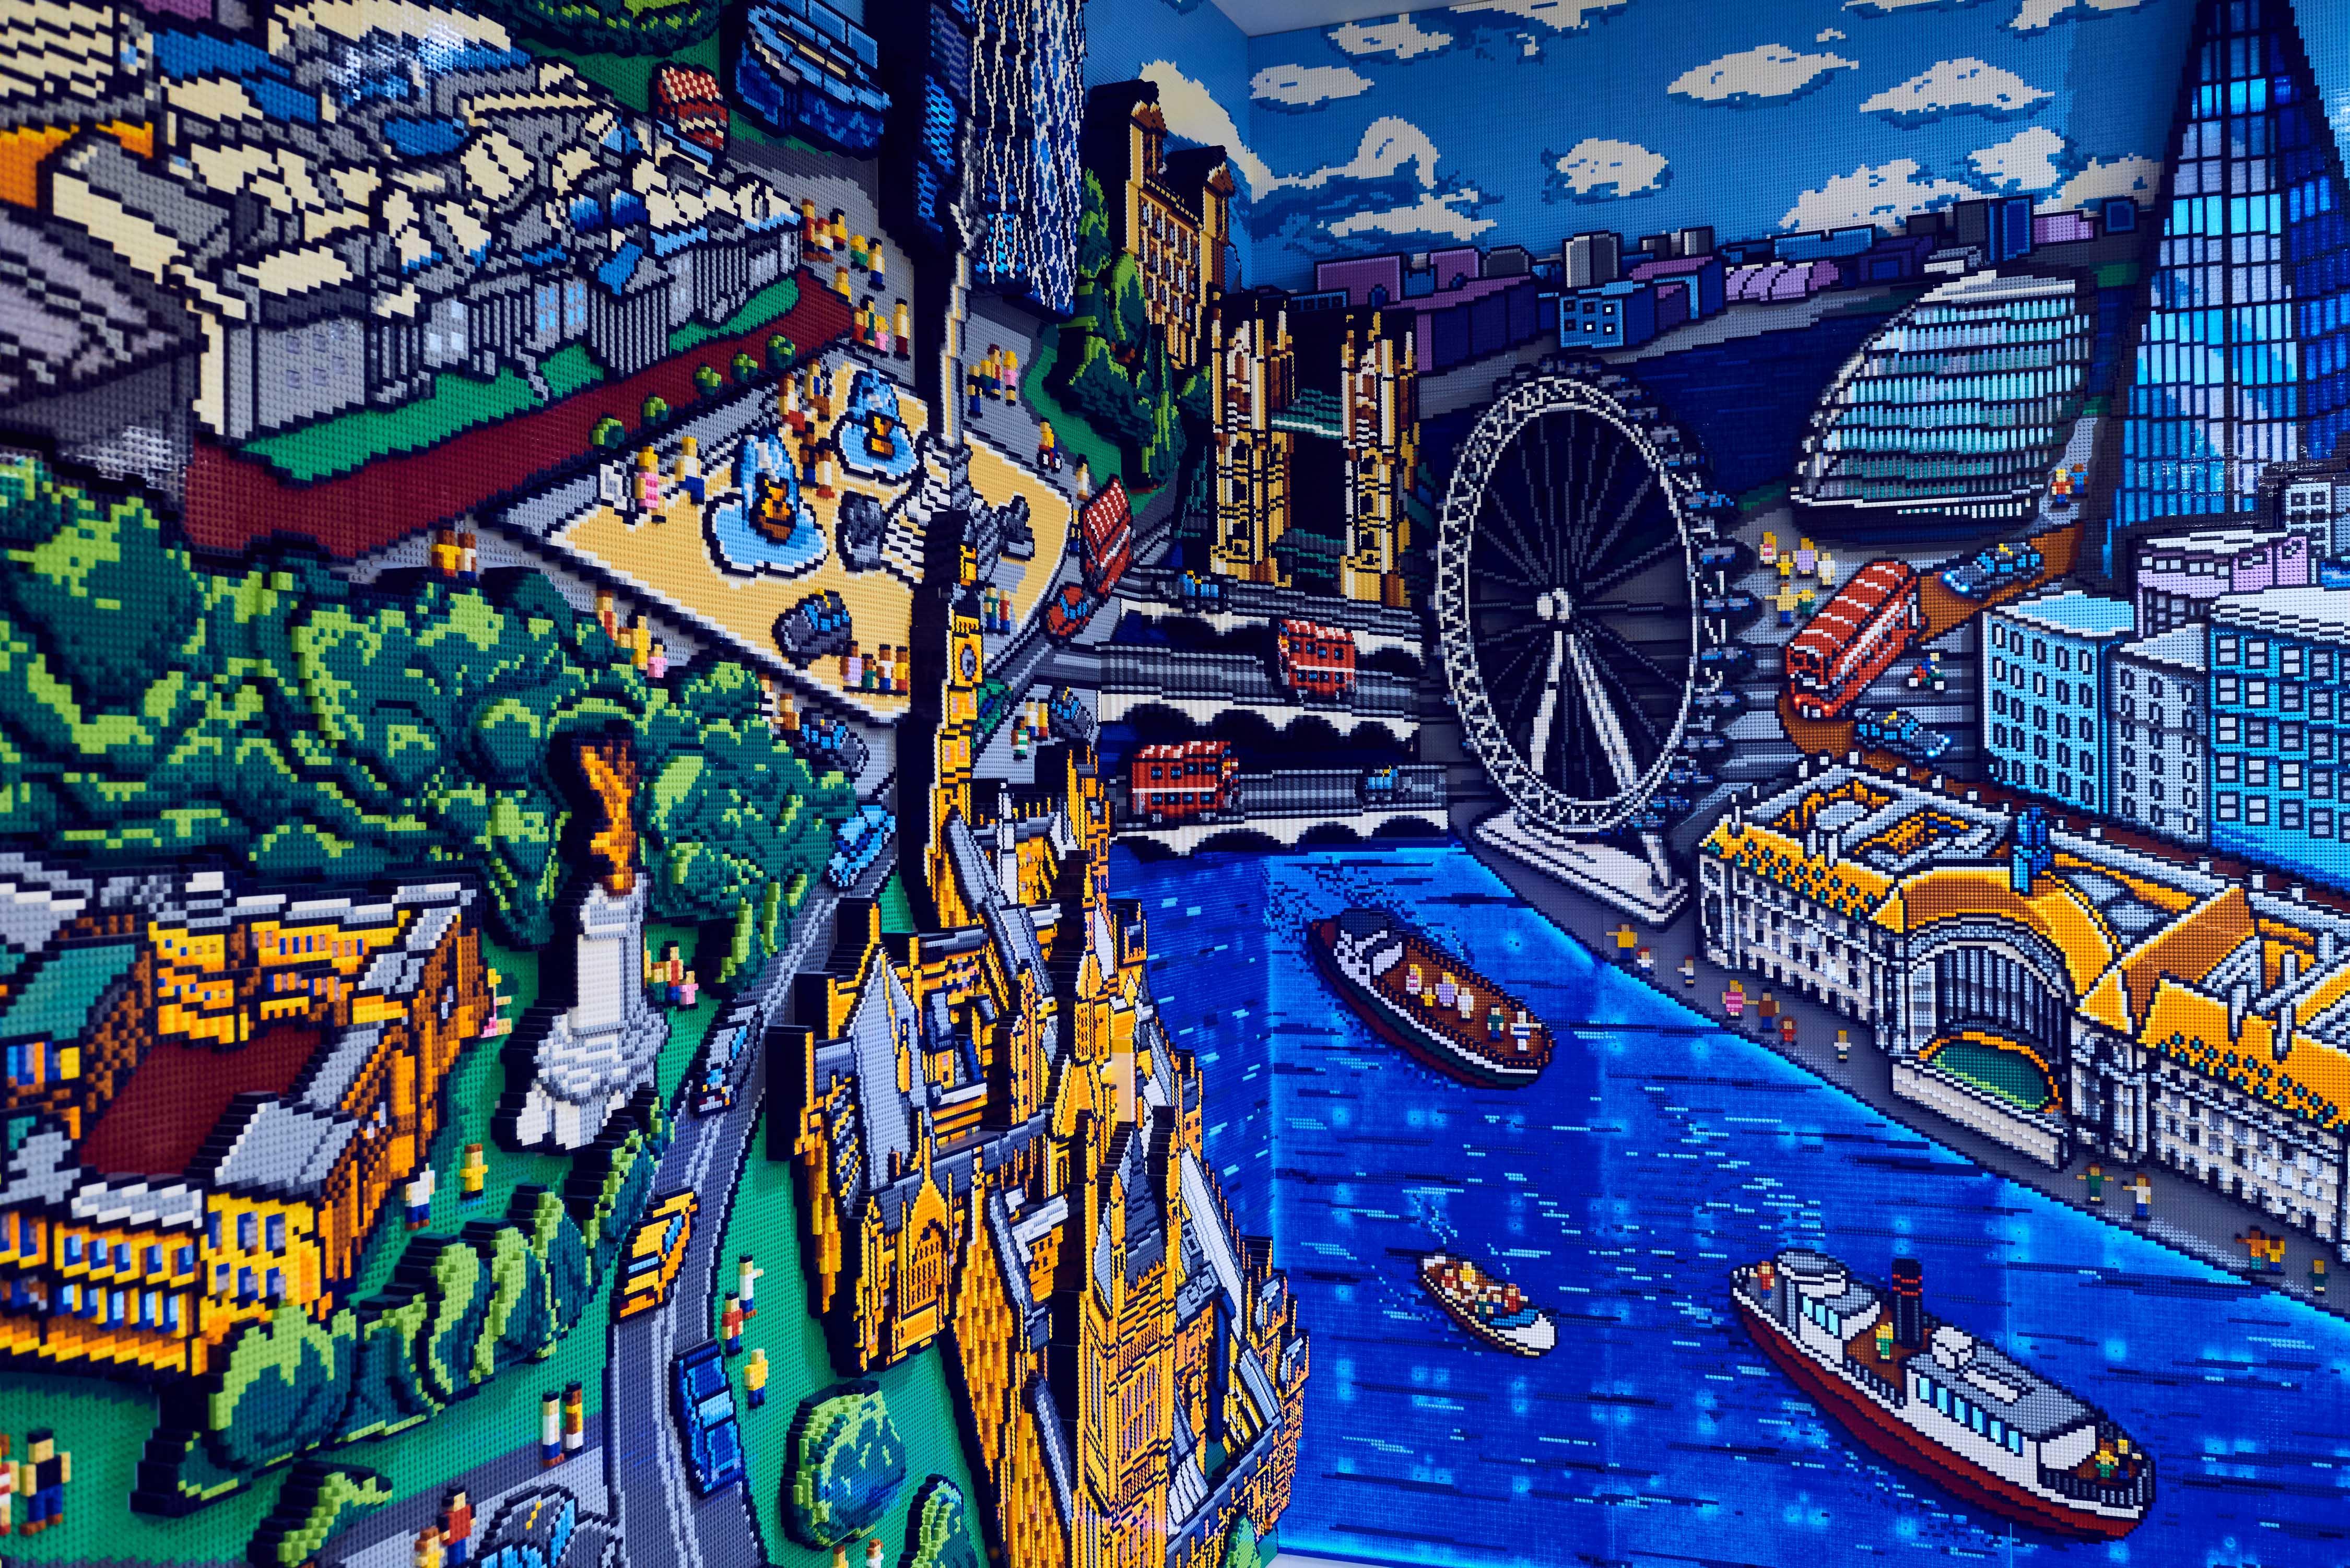 A Lego mosaic of London's skyline.